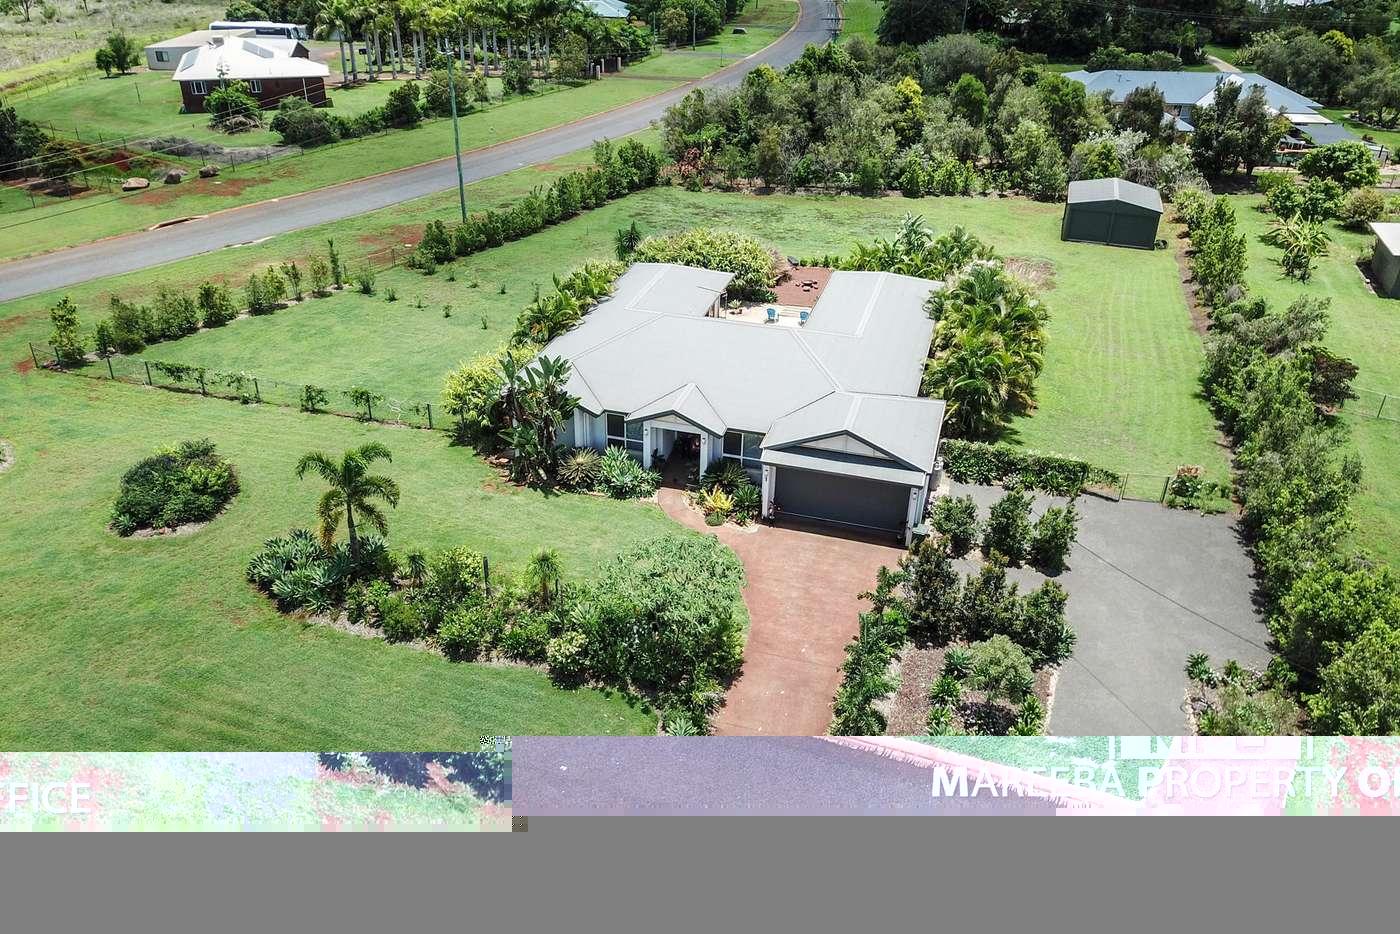 Main view of Homely house listing, 1 Teresa Close, Mareeba QLD 4880